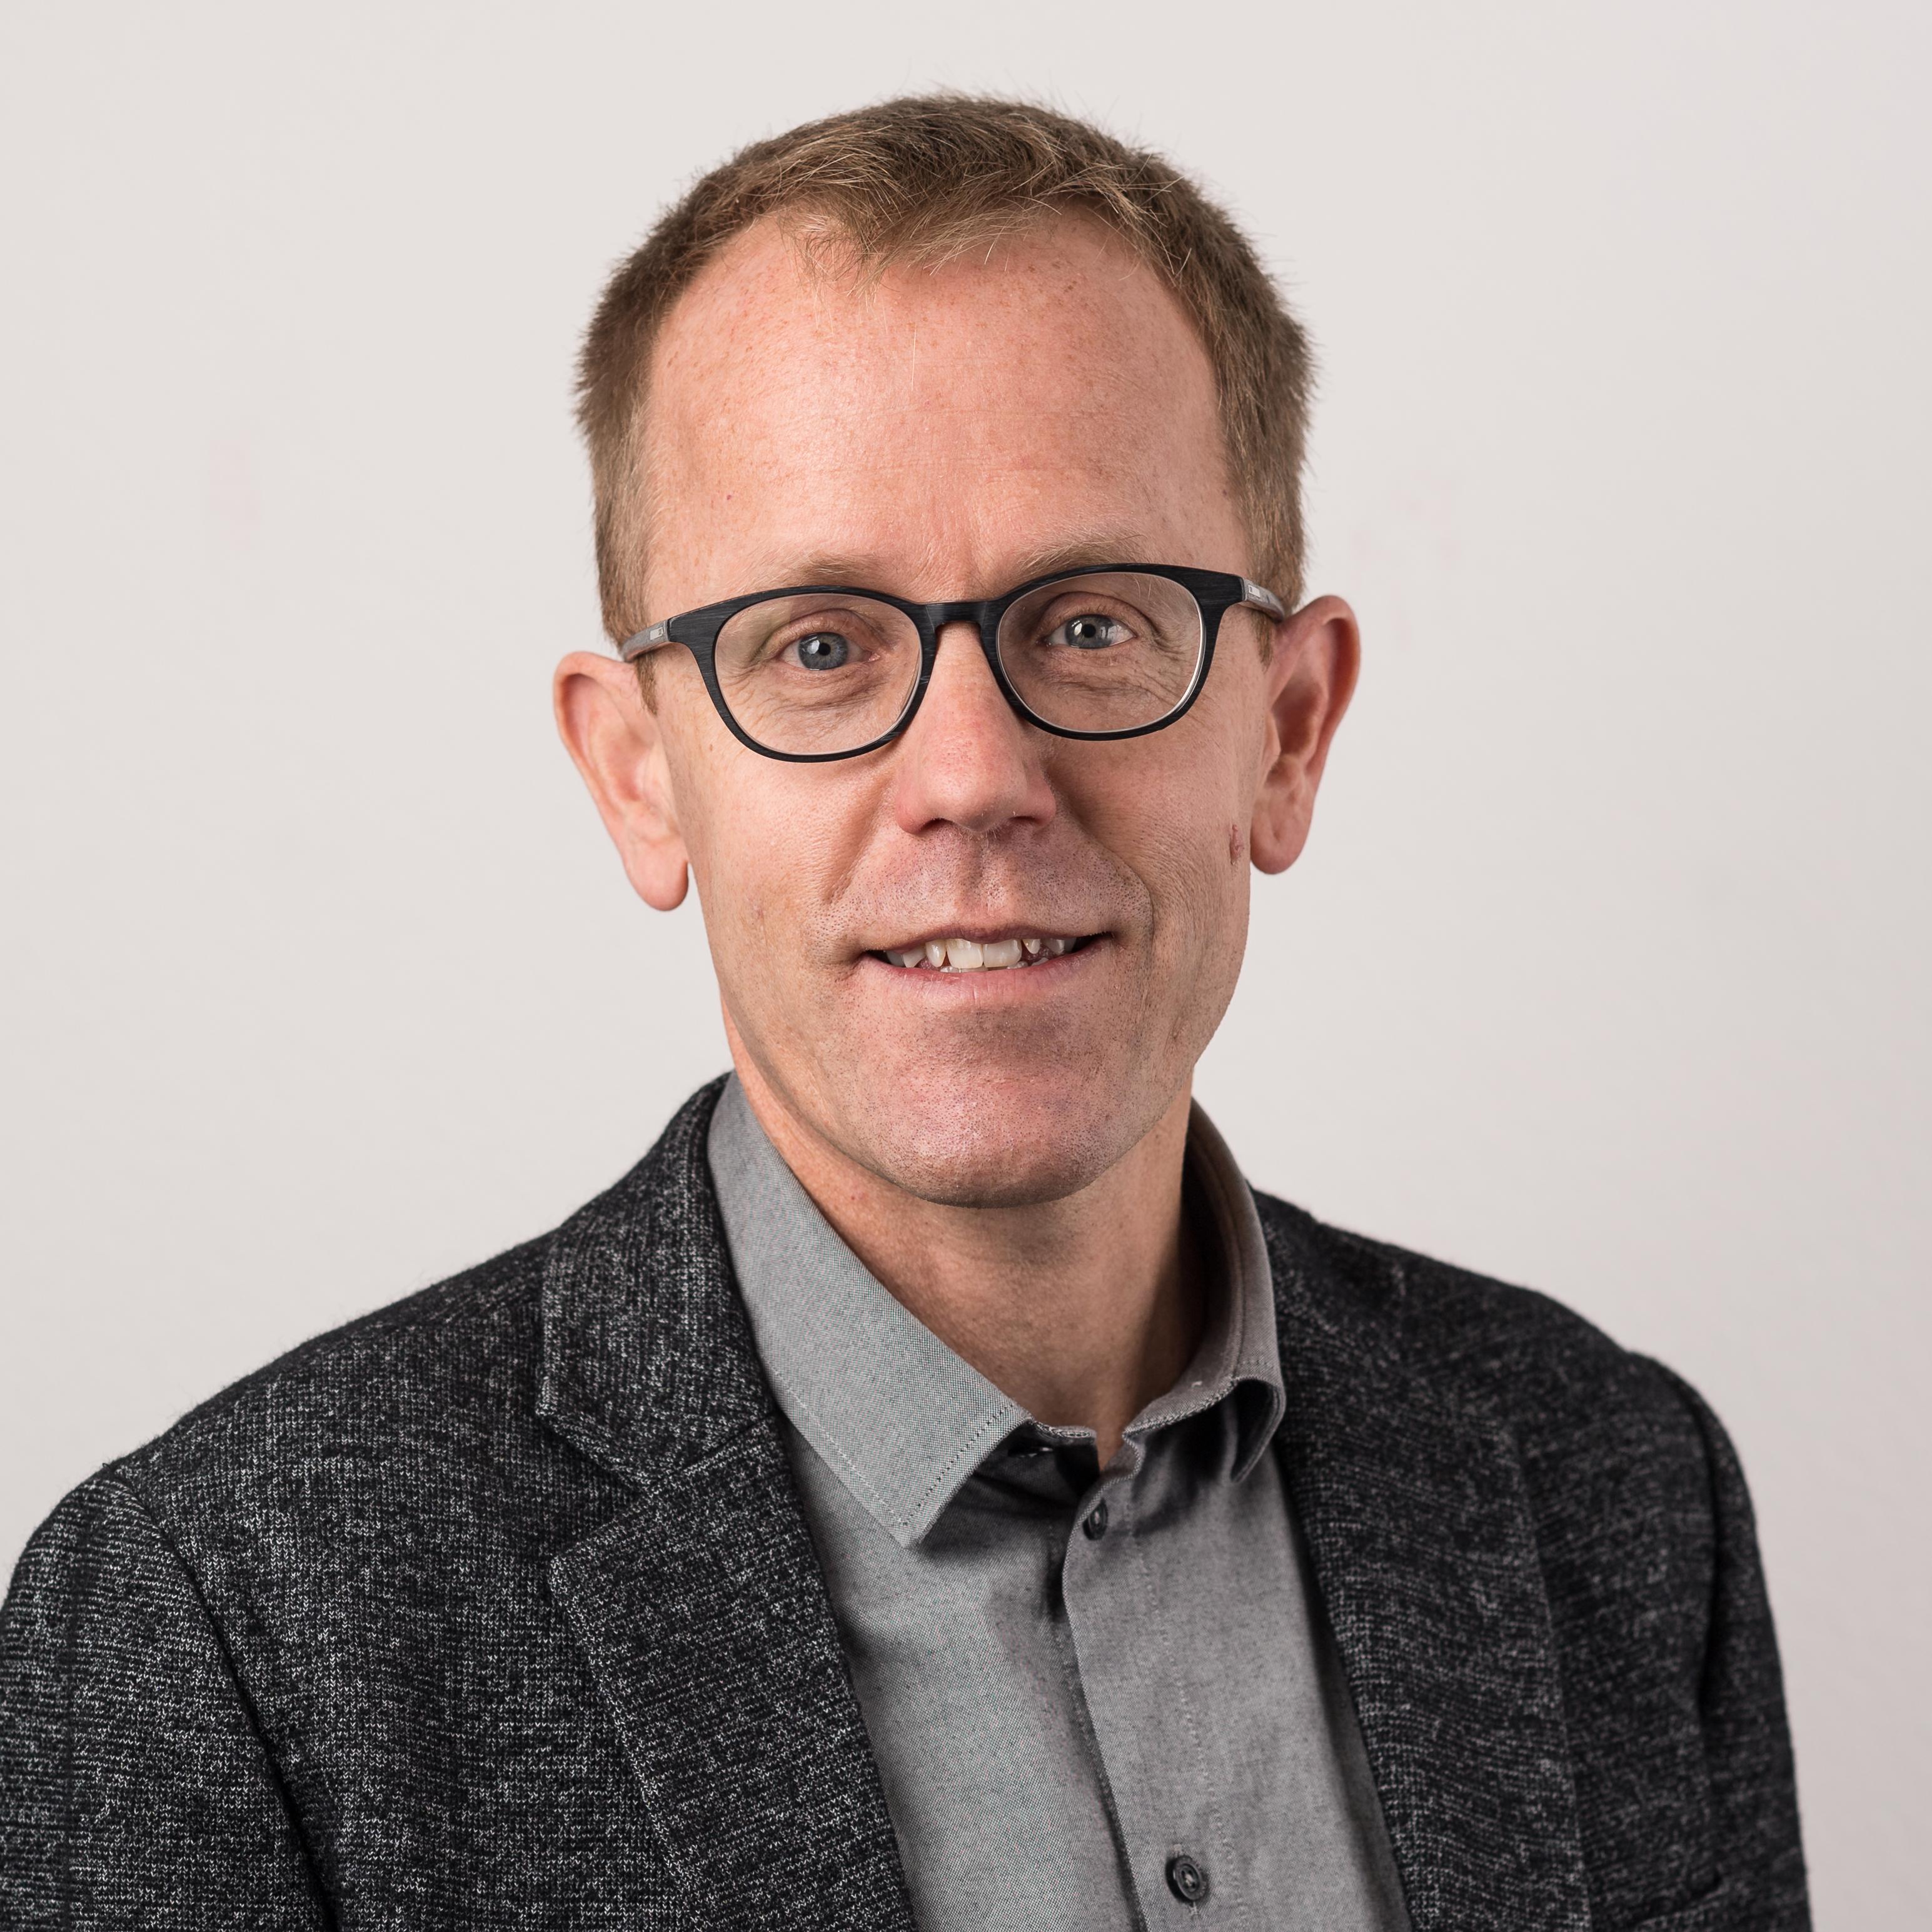 Medical Visionary Case Study: Dr Philip Bruggman